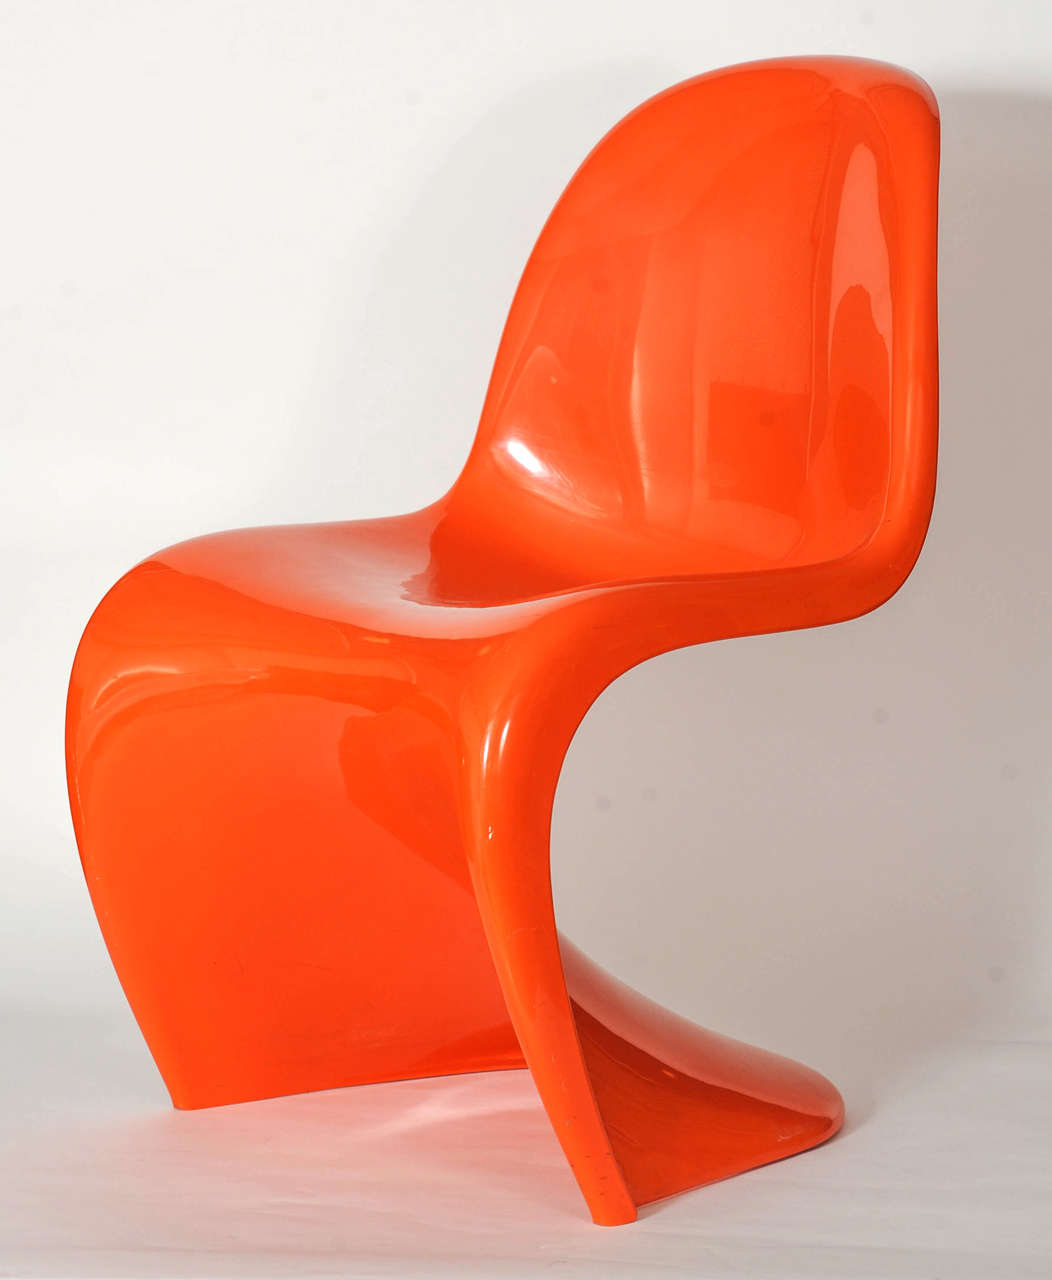 Panton Stuhl Original set of two original panton s chairs for sale at 1stdibs